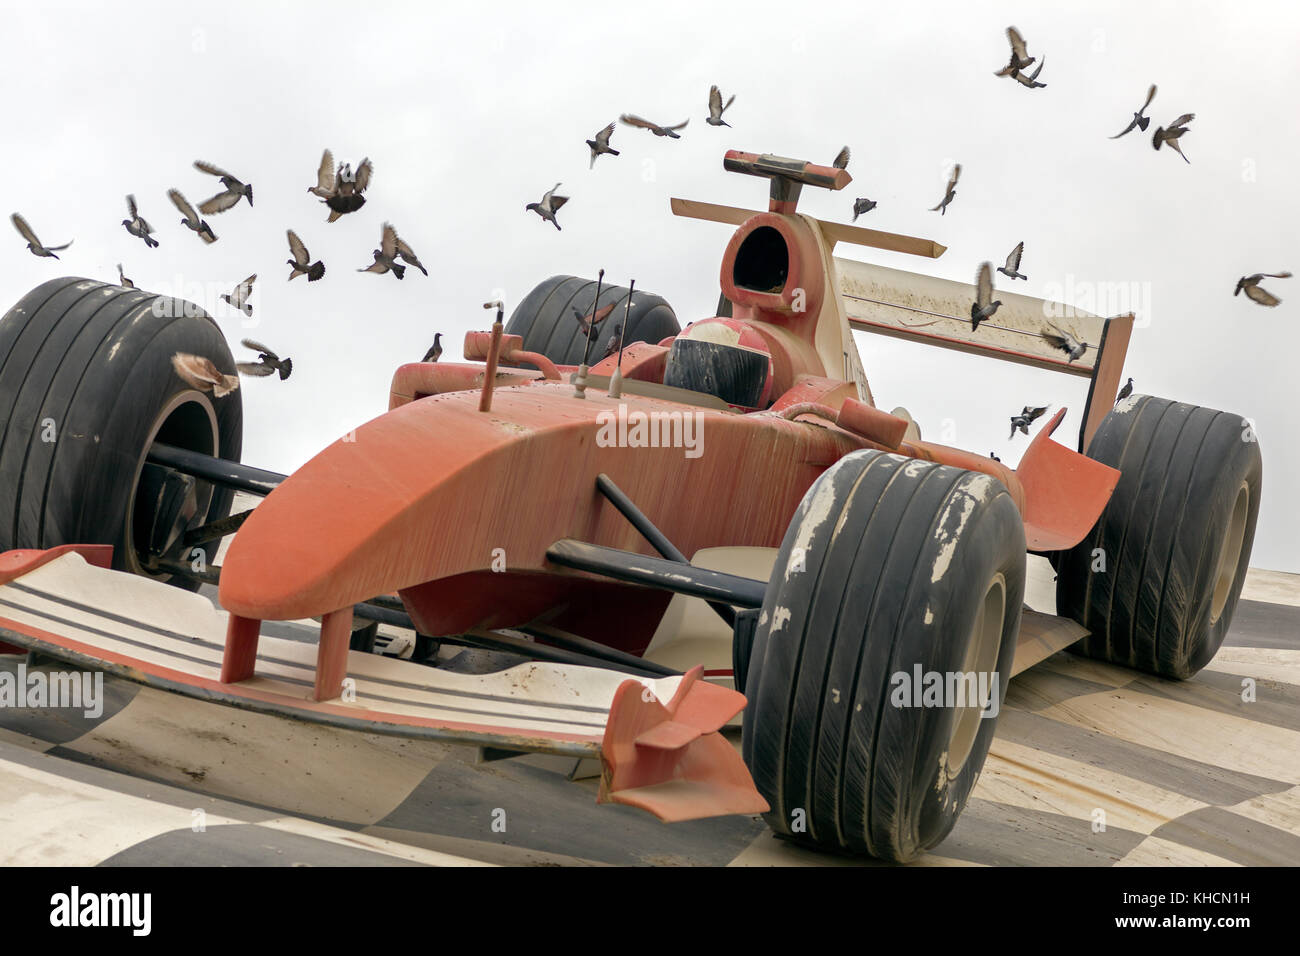 Decayed reconstruction of a formular racing car as an attraction of amusement park Dubailand - Stock Image